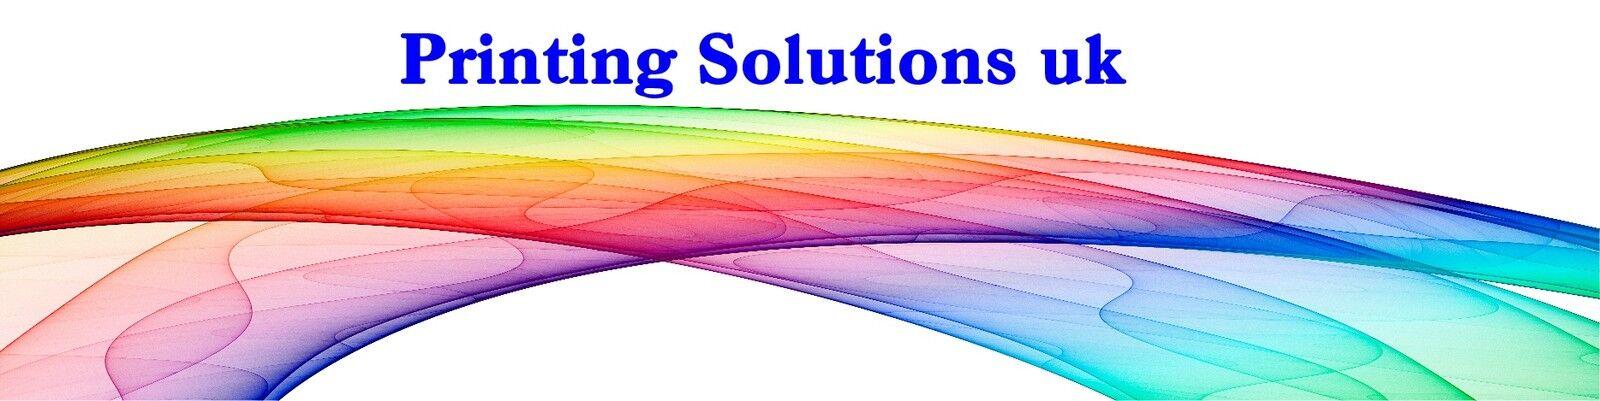 Printing Solution UK